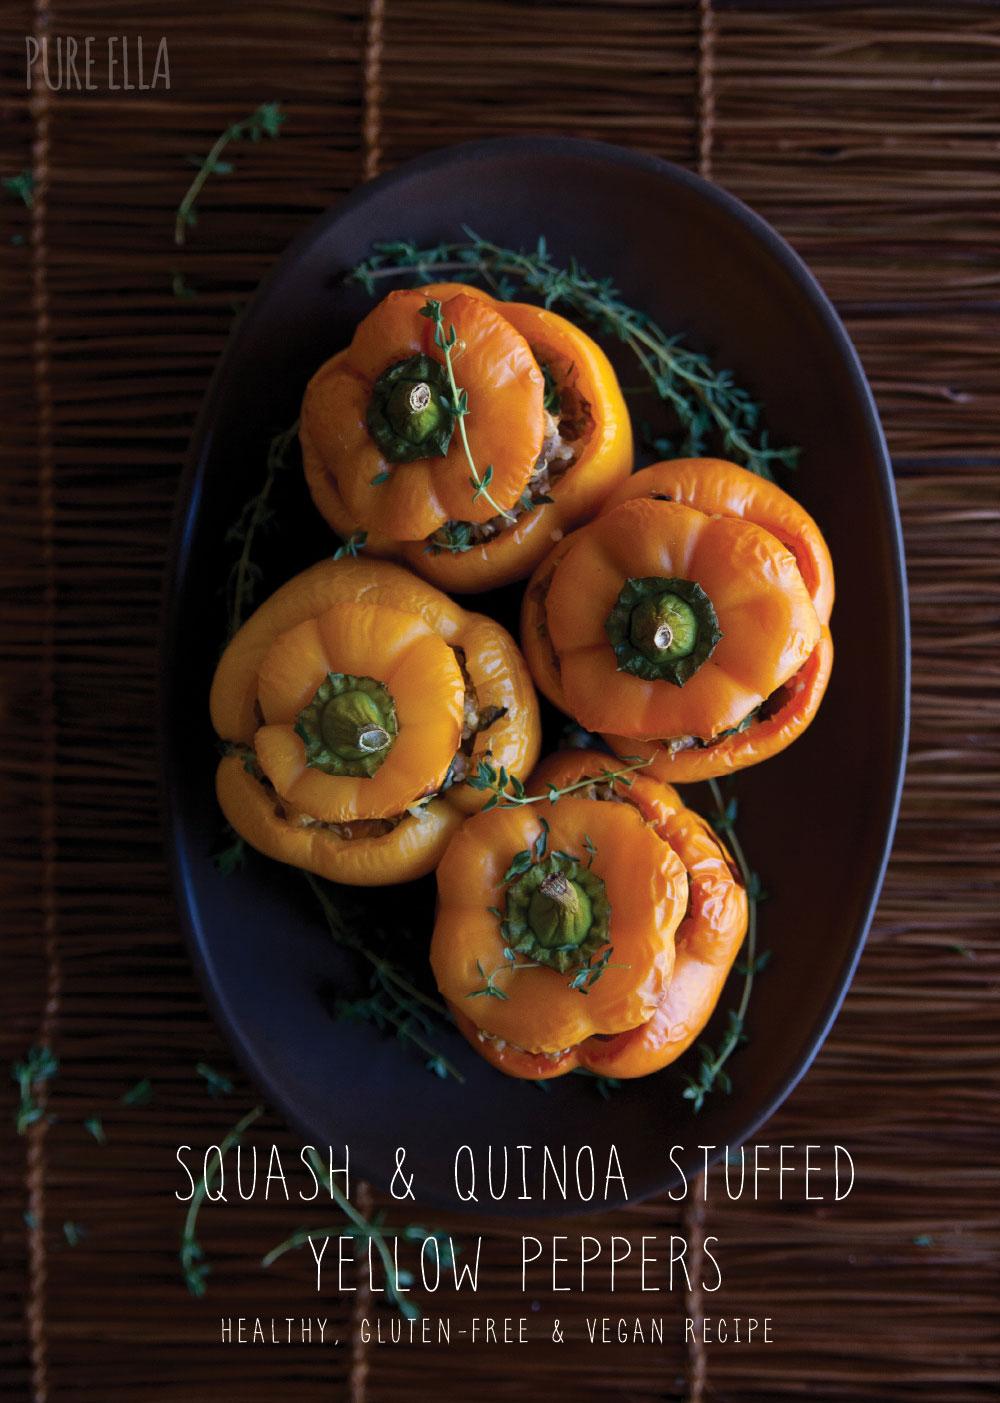 Pure-Ella-Squash-and-Quinoa-Stuffed-Yellow-Peppers-gluten-free-and-vegan-recipe